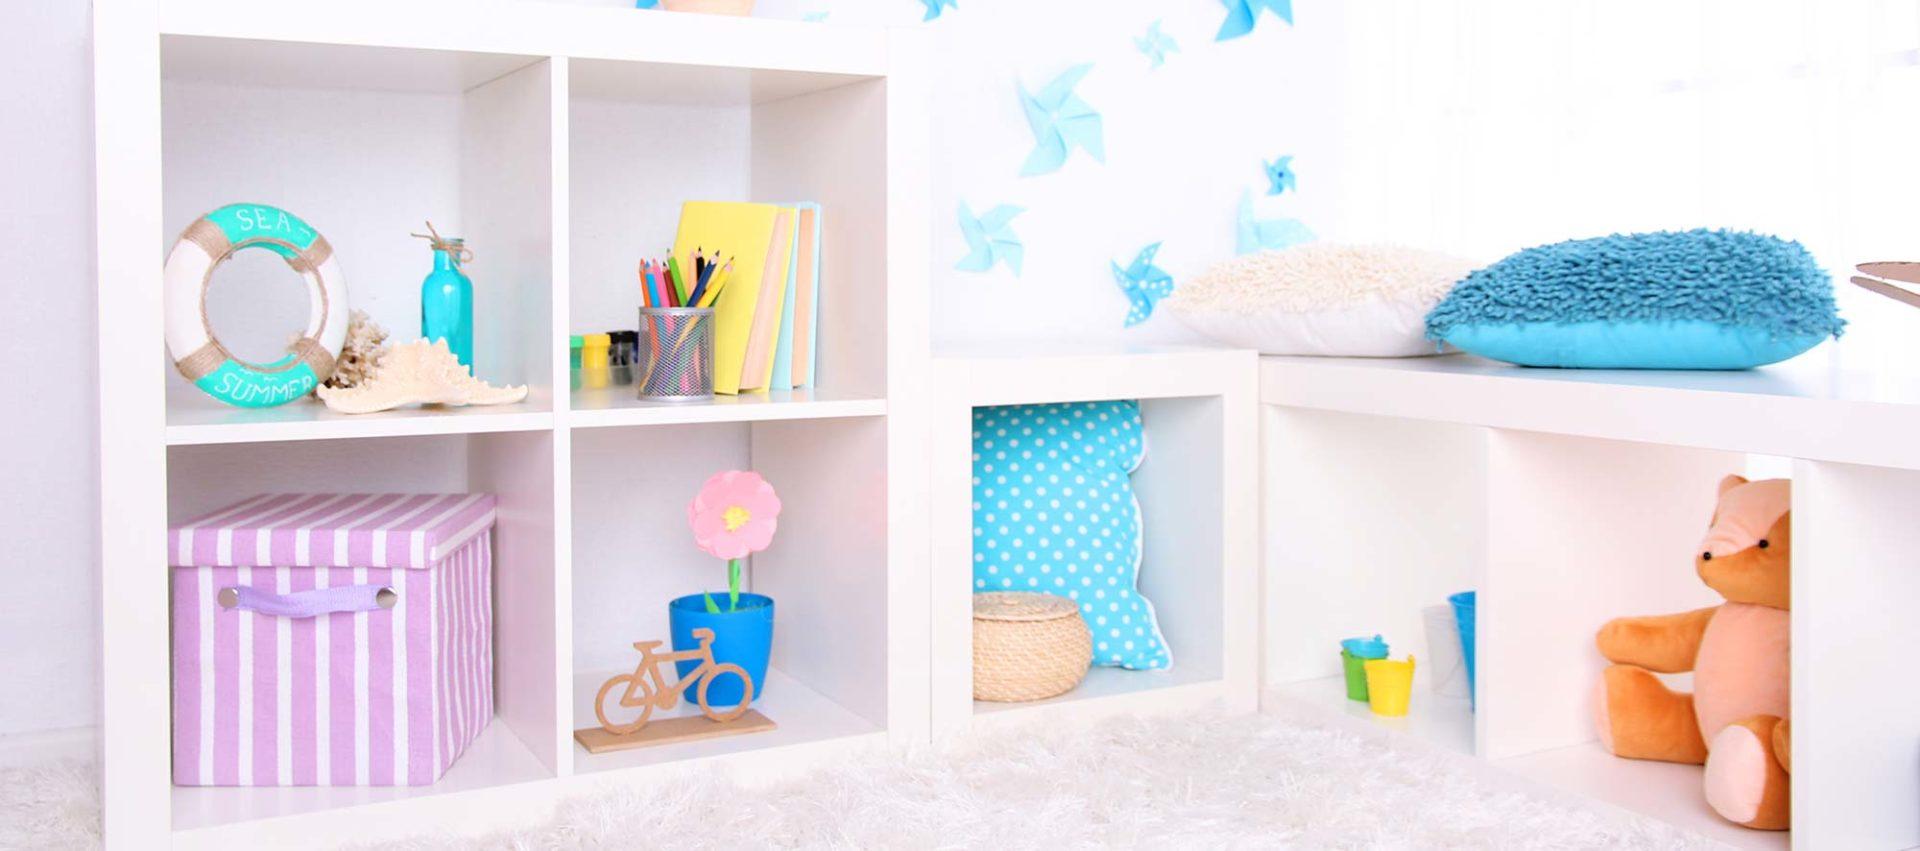 bildquelle africa studio. Black Bedroom Furniture Sets. Home Design Ideas